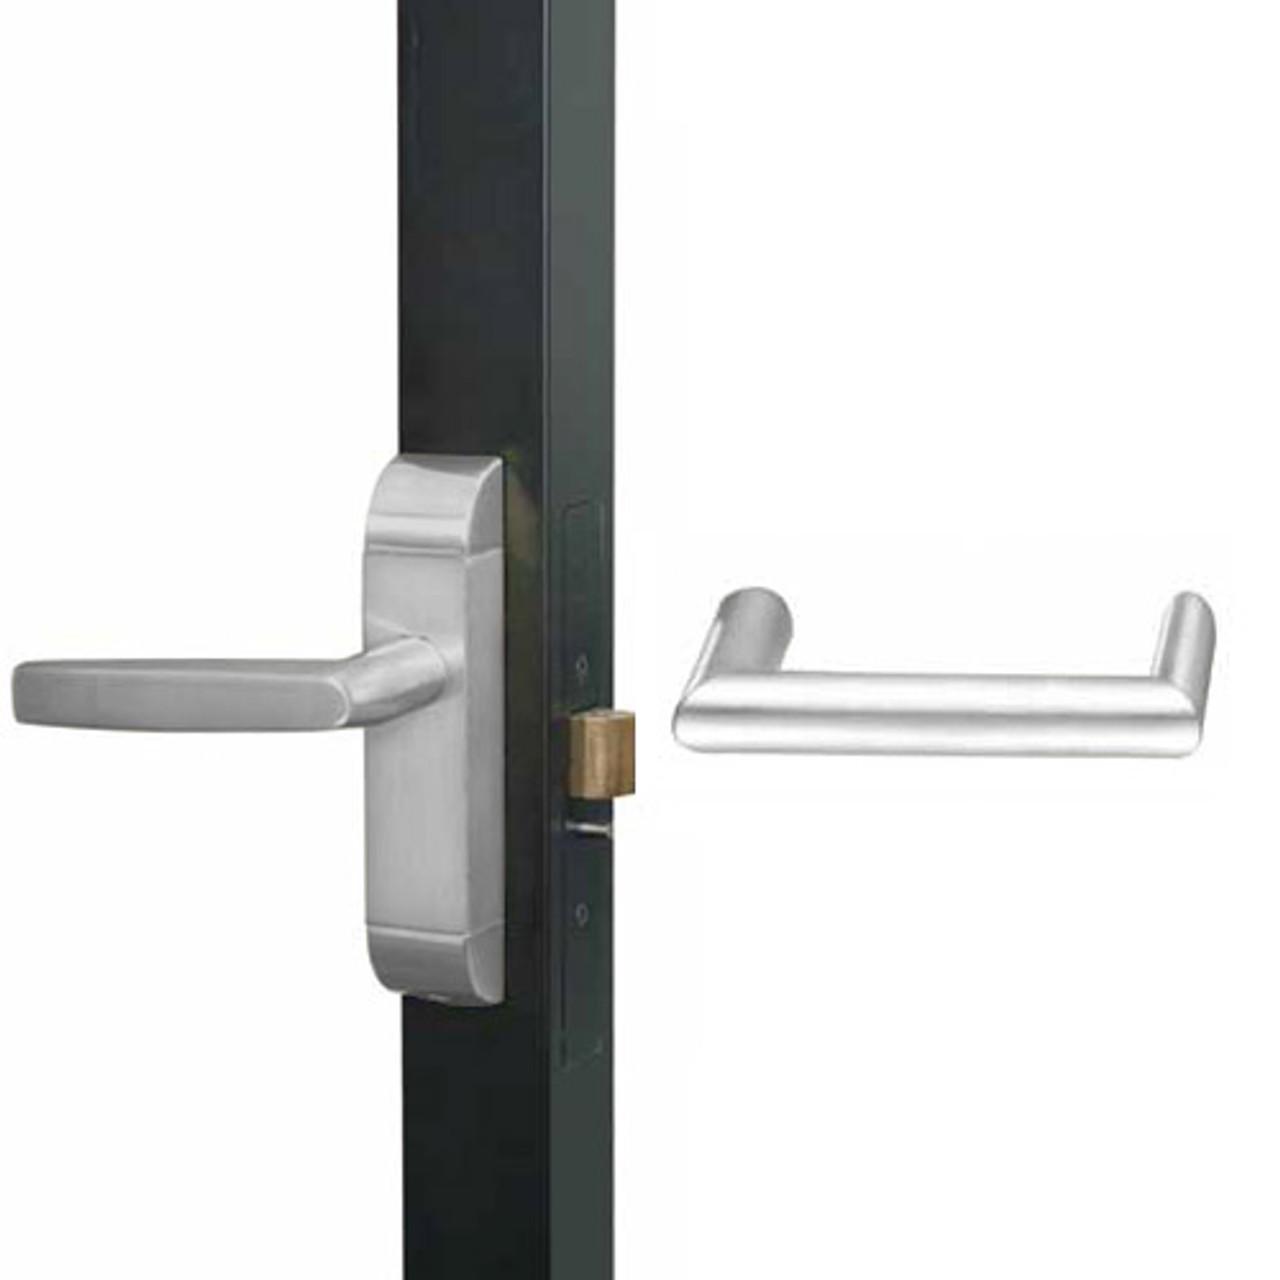 4600-MW-611-US32 Adams Rite MW Designer Deadlatch handle in Bright Stainless Finish